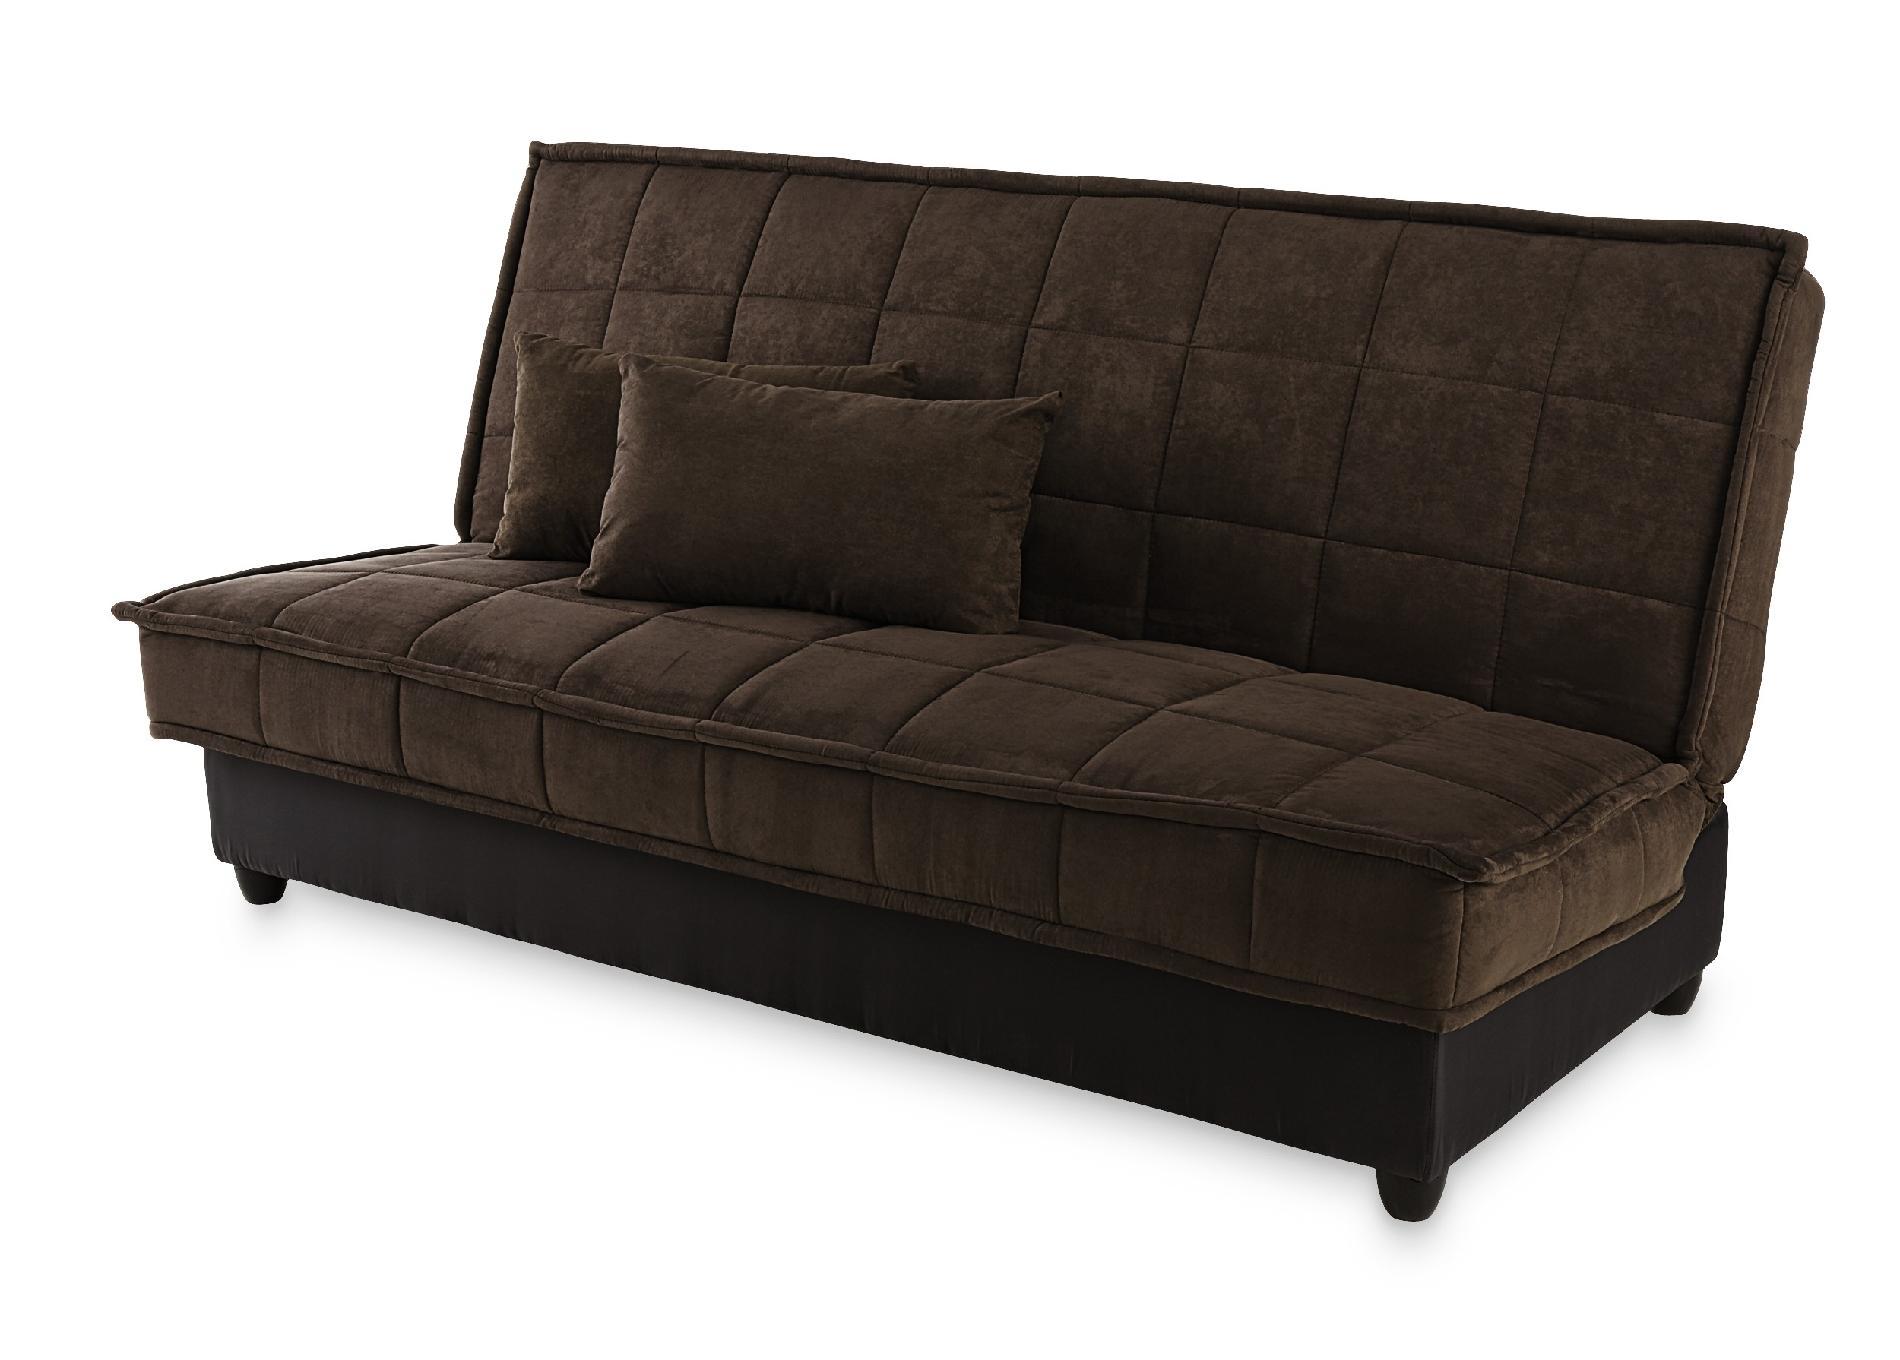 sofa bed covers kmart sheffield gumtree sauder kennedy futon home furniture living room